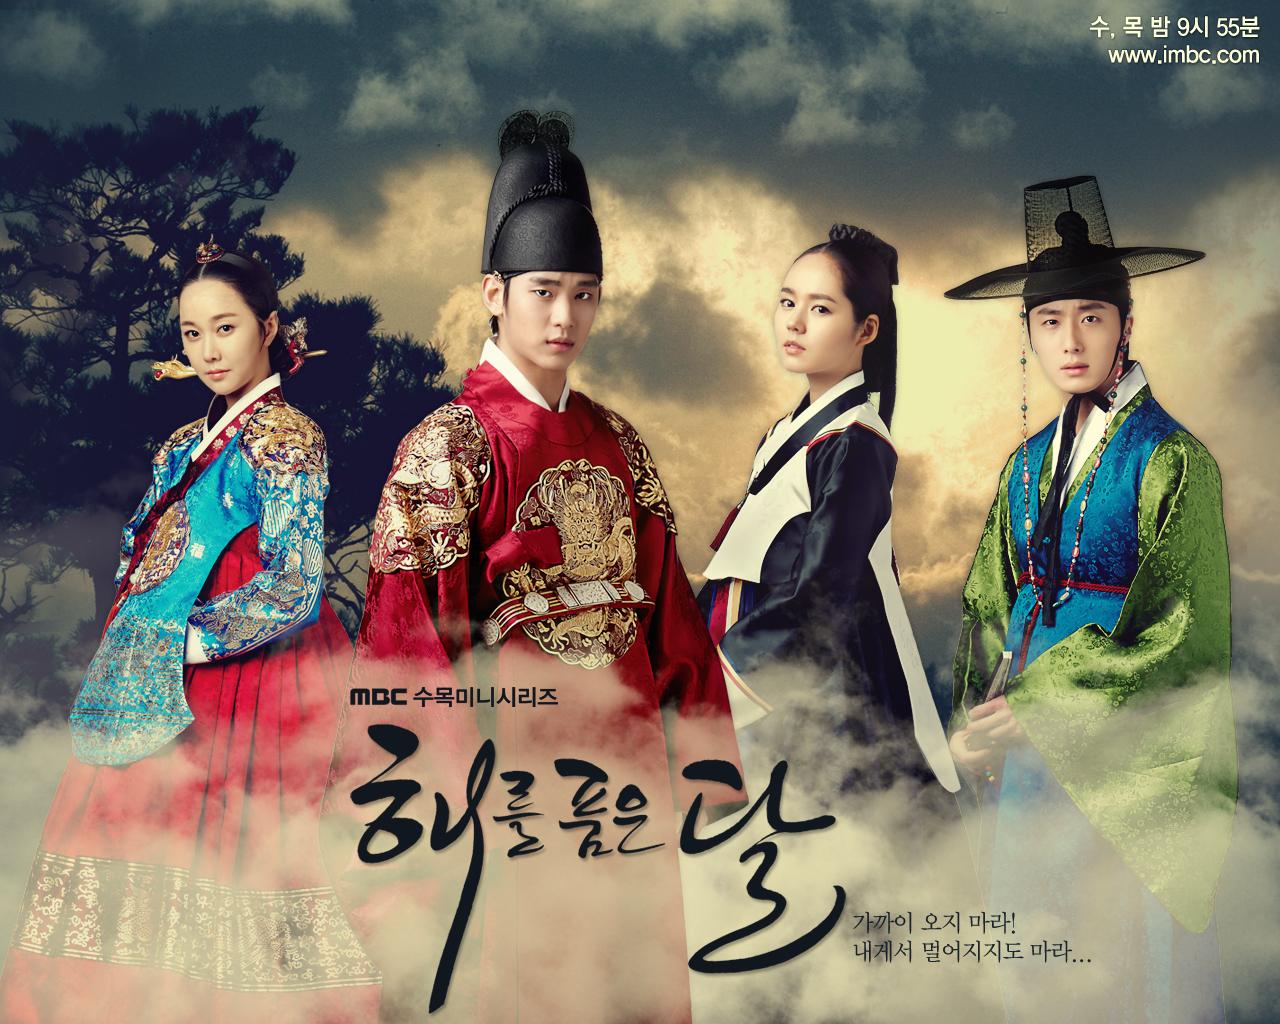 korean drama wallpaper terbaru 2012 Page 8 1280x1024